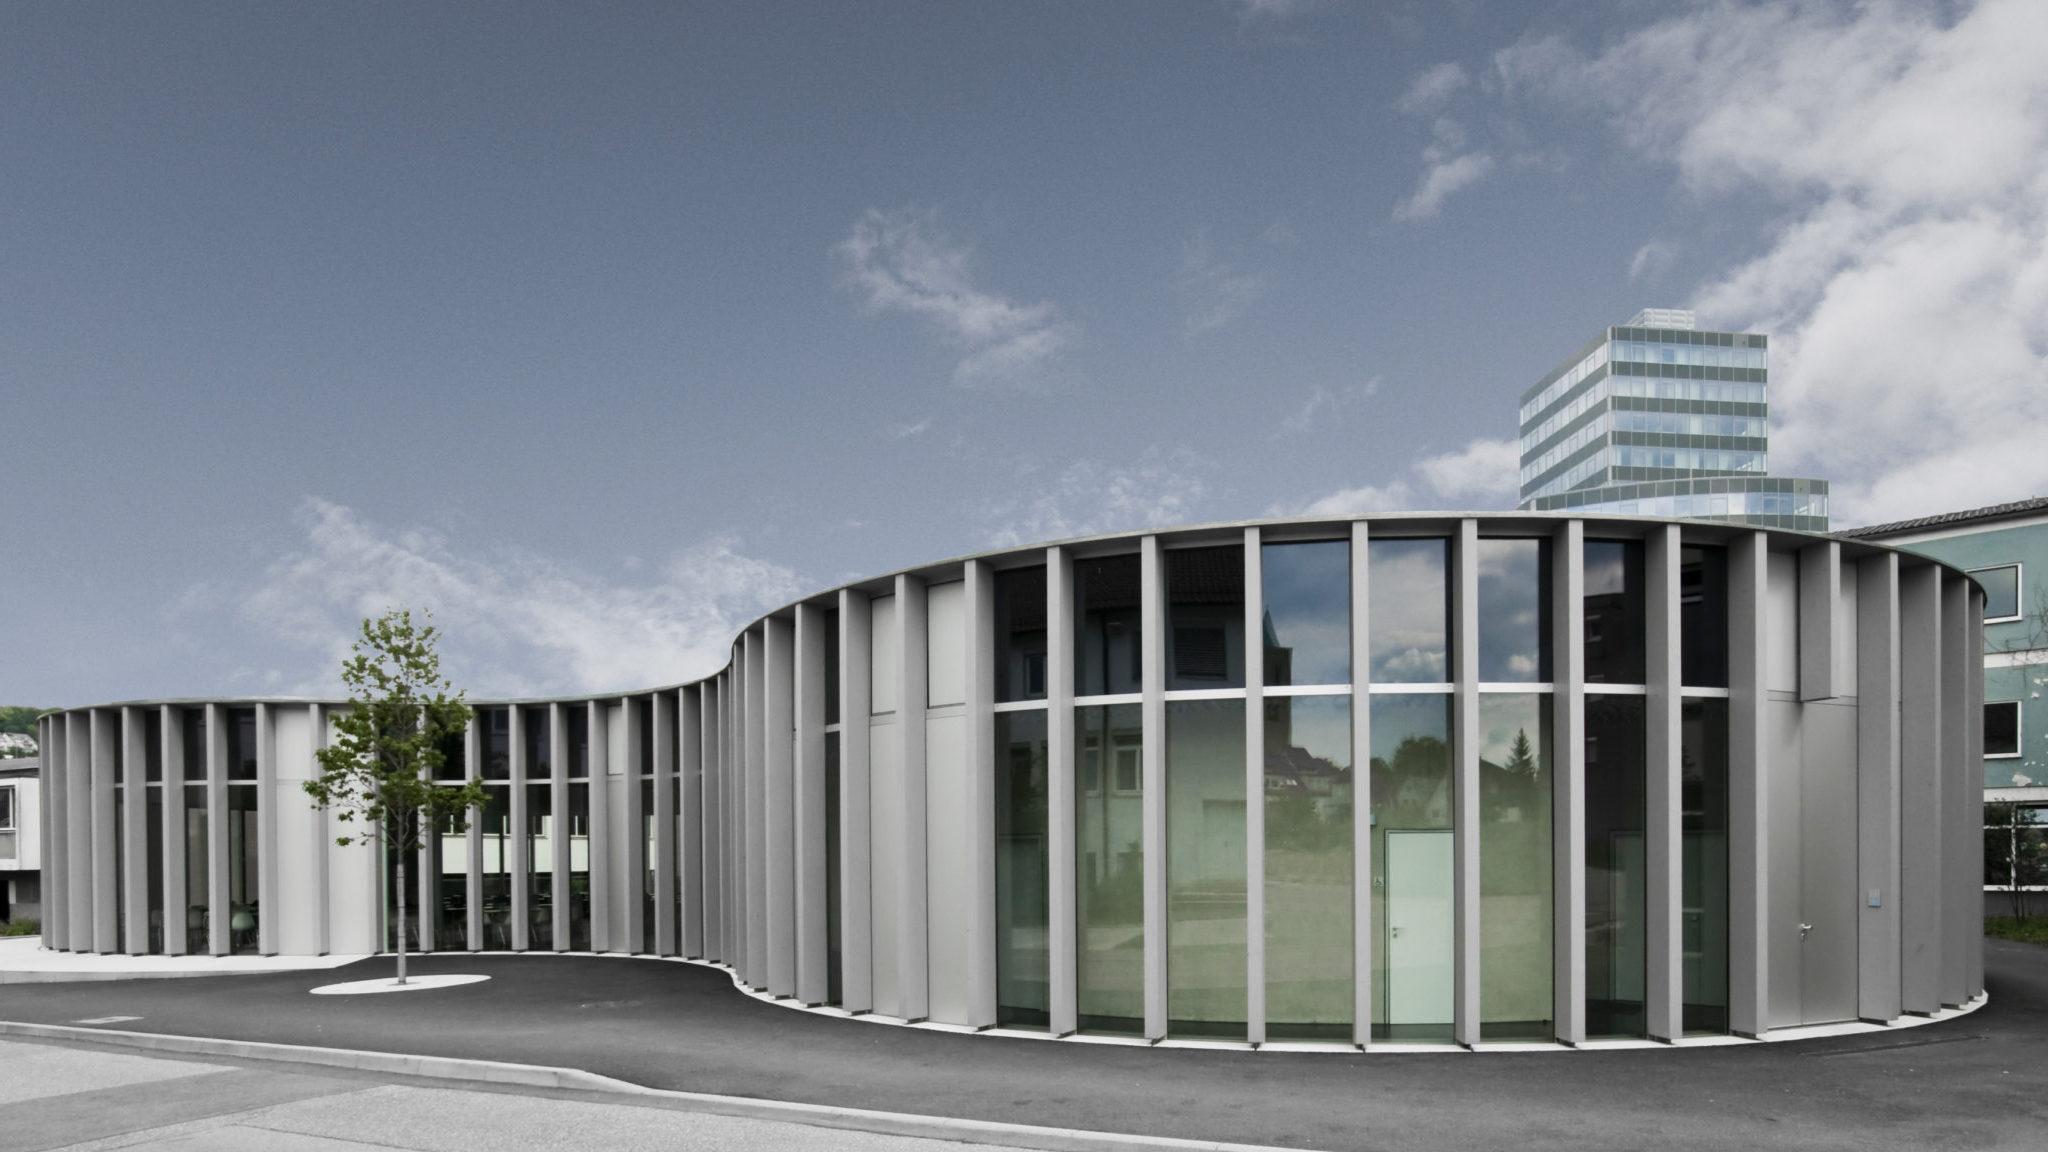 Mensa Leonberg (Dongus Architekten)